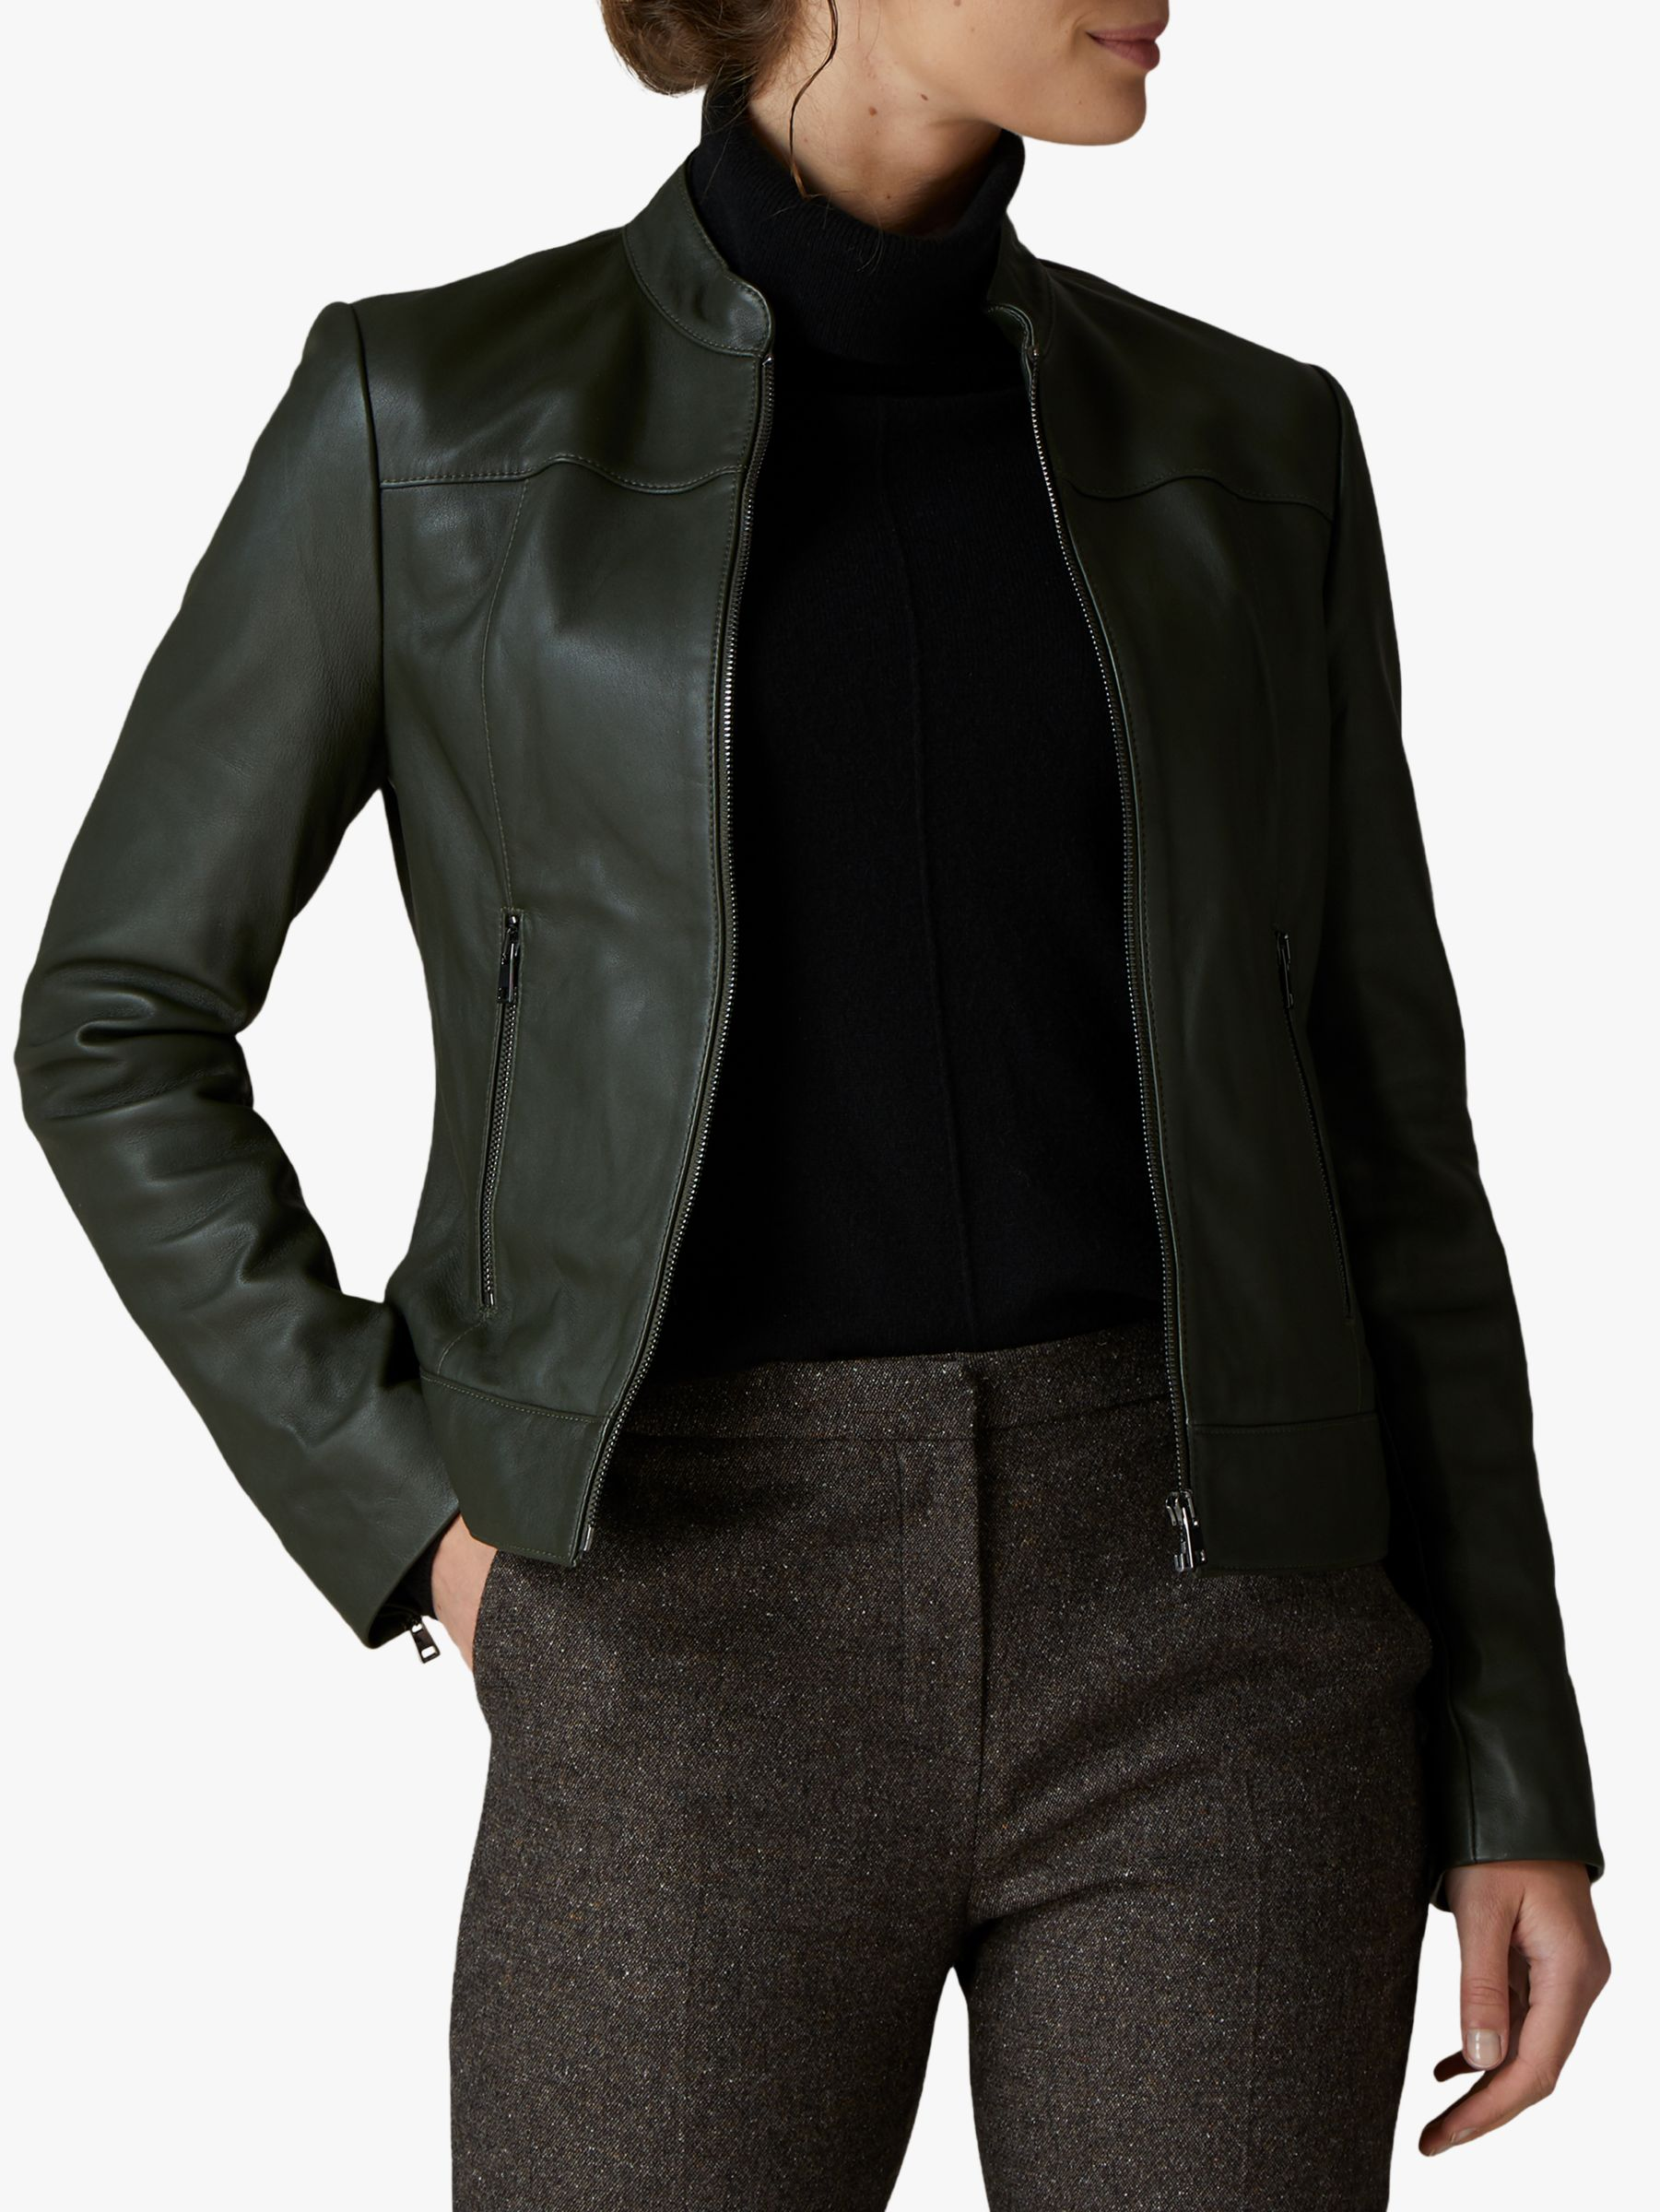 Jaeger Jaeger Stand Collar Leather Biker Jacket, Green